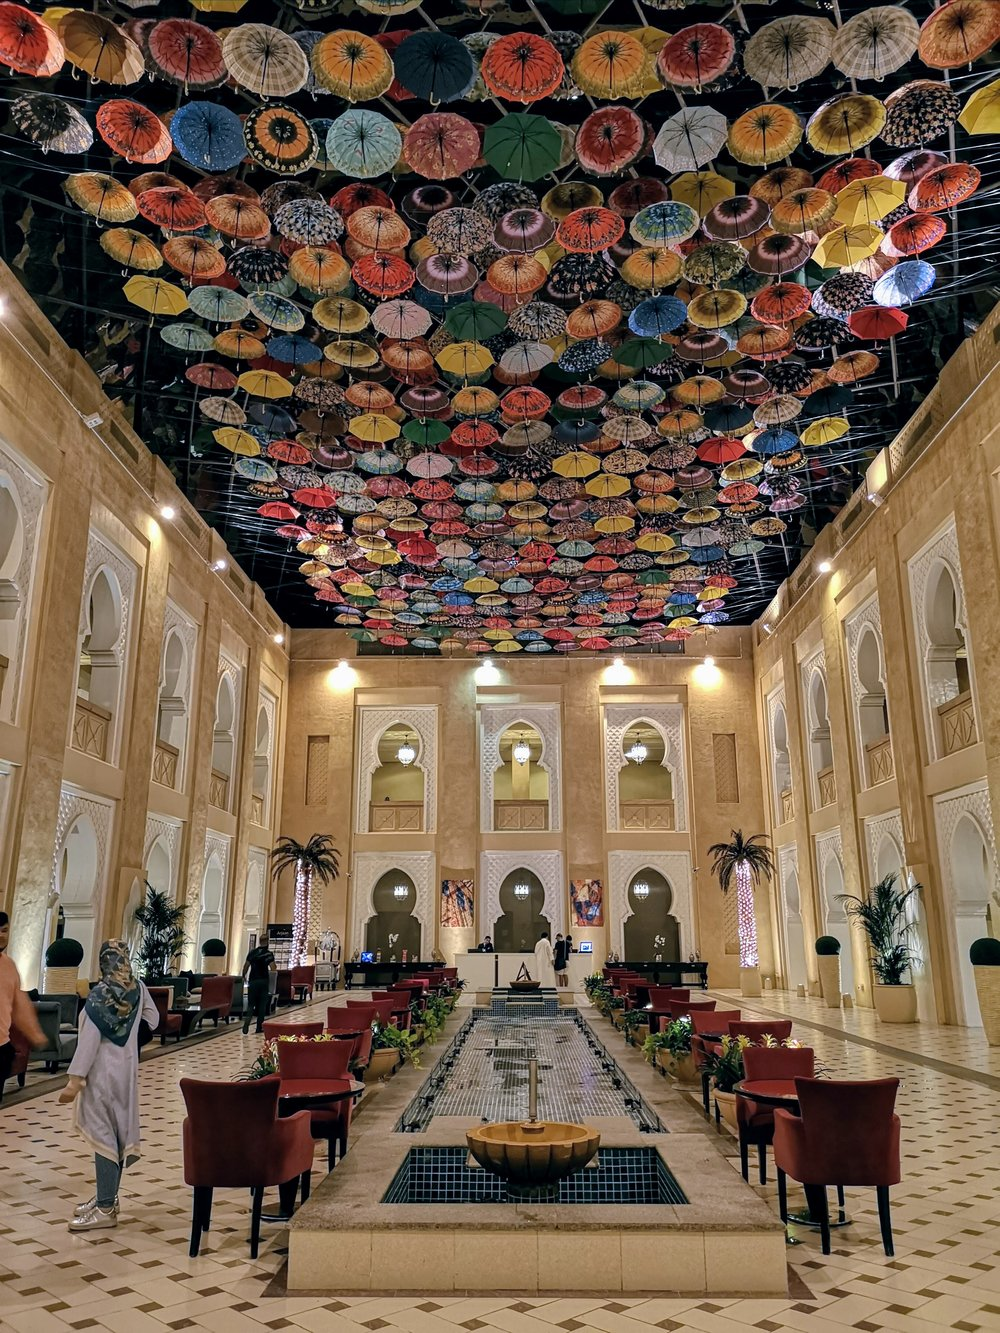 Arjaan by Rotana Dubai lobby #dubai #uae #hotel #lobby